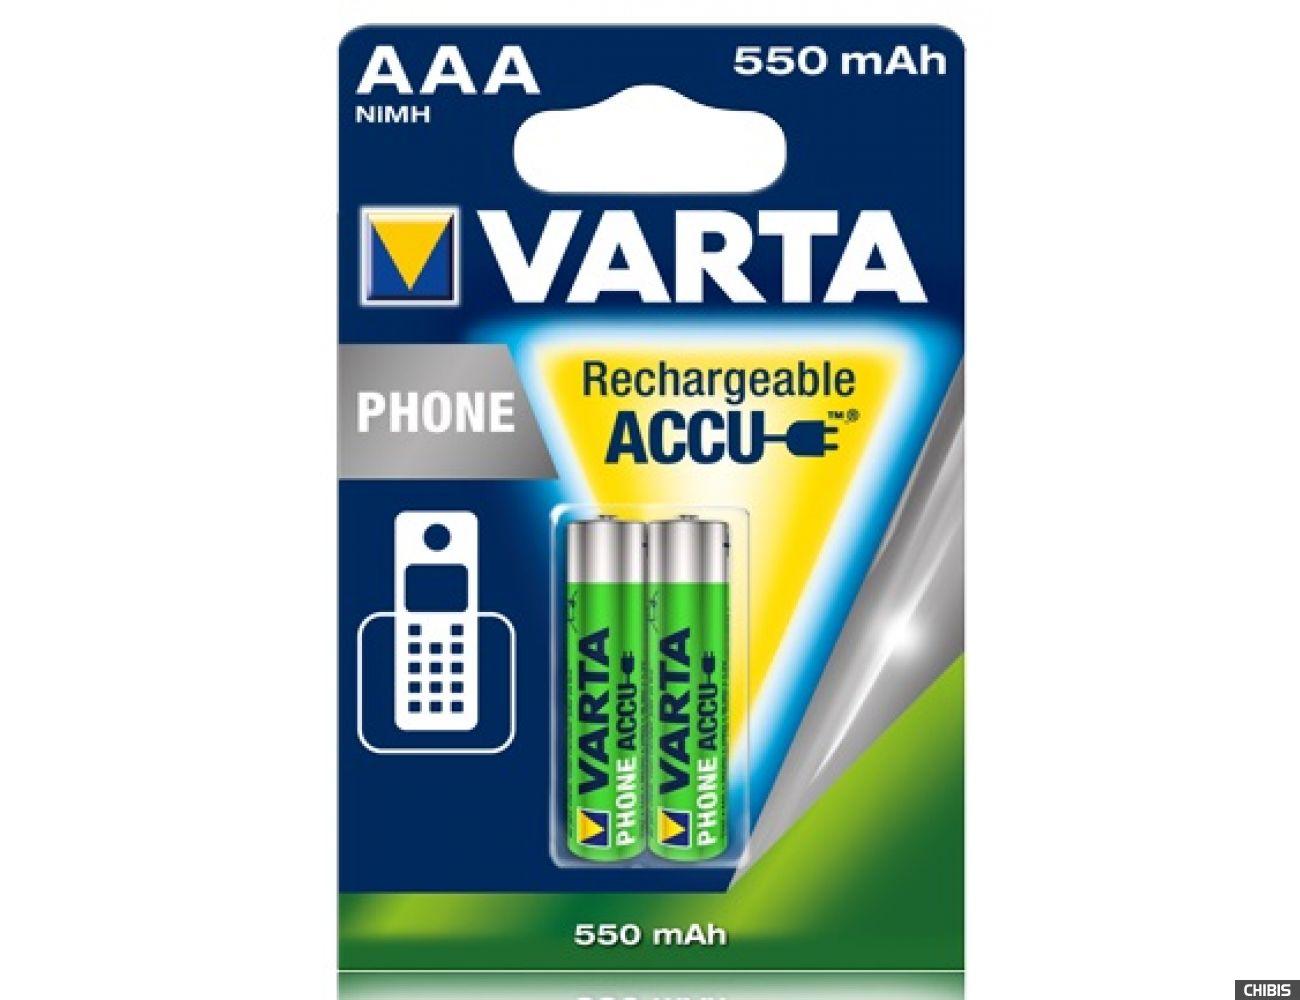 Аккумуляторные батарейки ААА для радиотелефона Varta 550 mAh Phone 2/2 шт. 58397101402